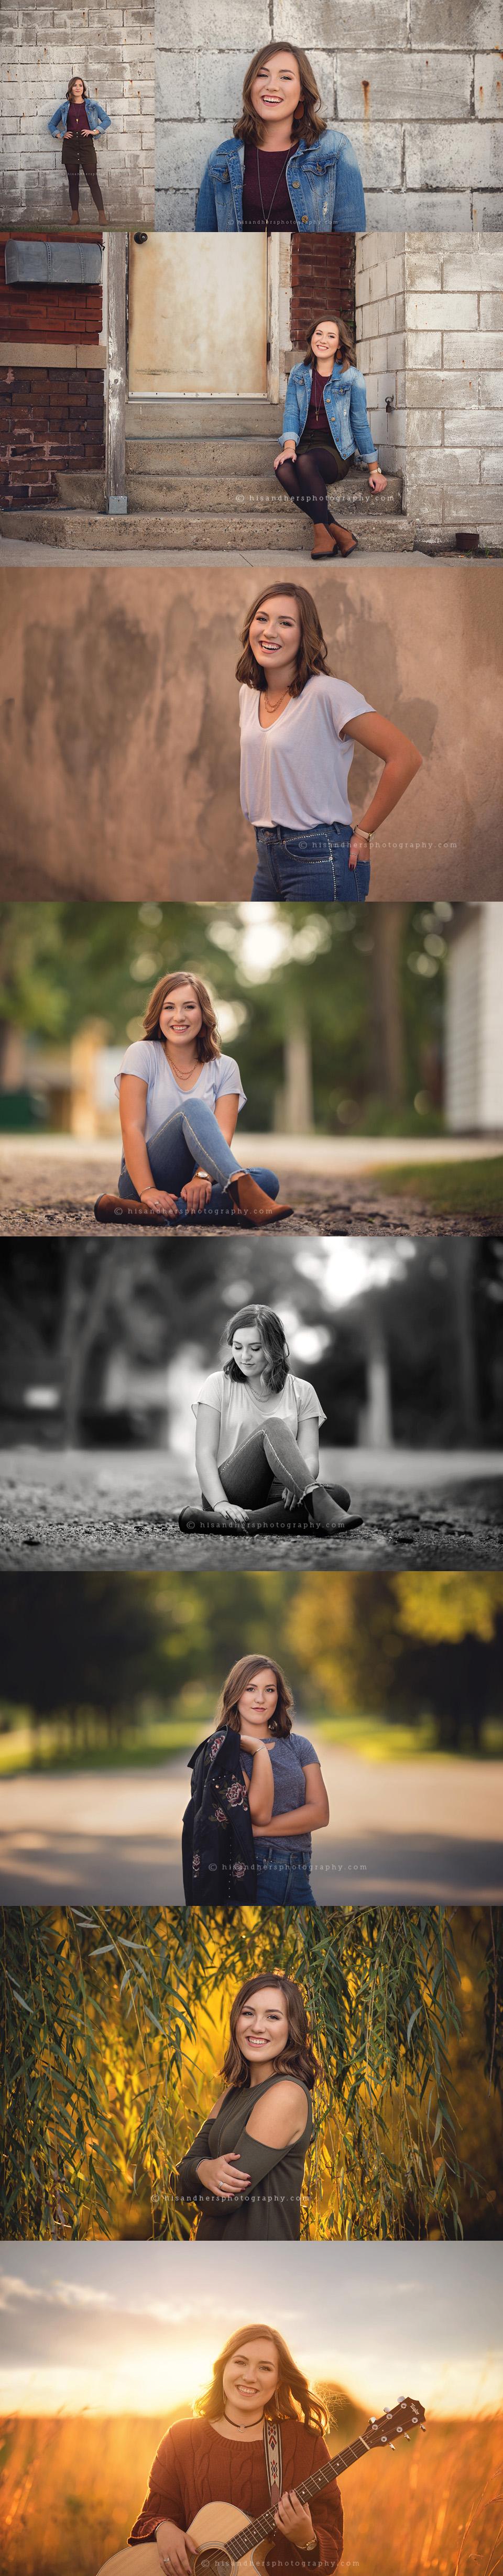 iowa senior pictures senior portraits photographer des moines high school seniors class of 2019 2020 2021